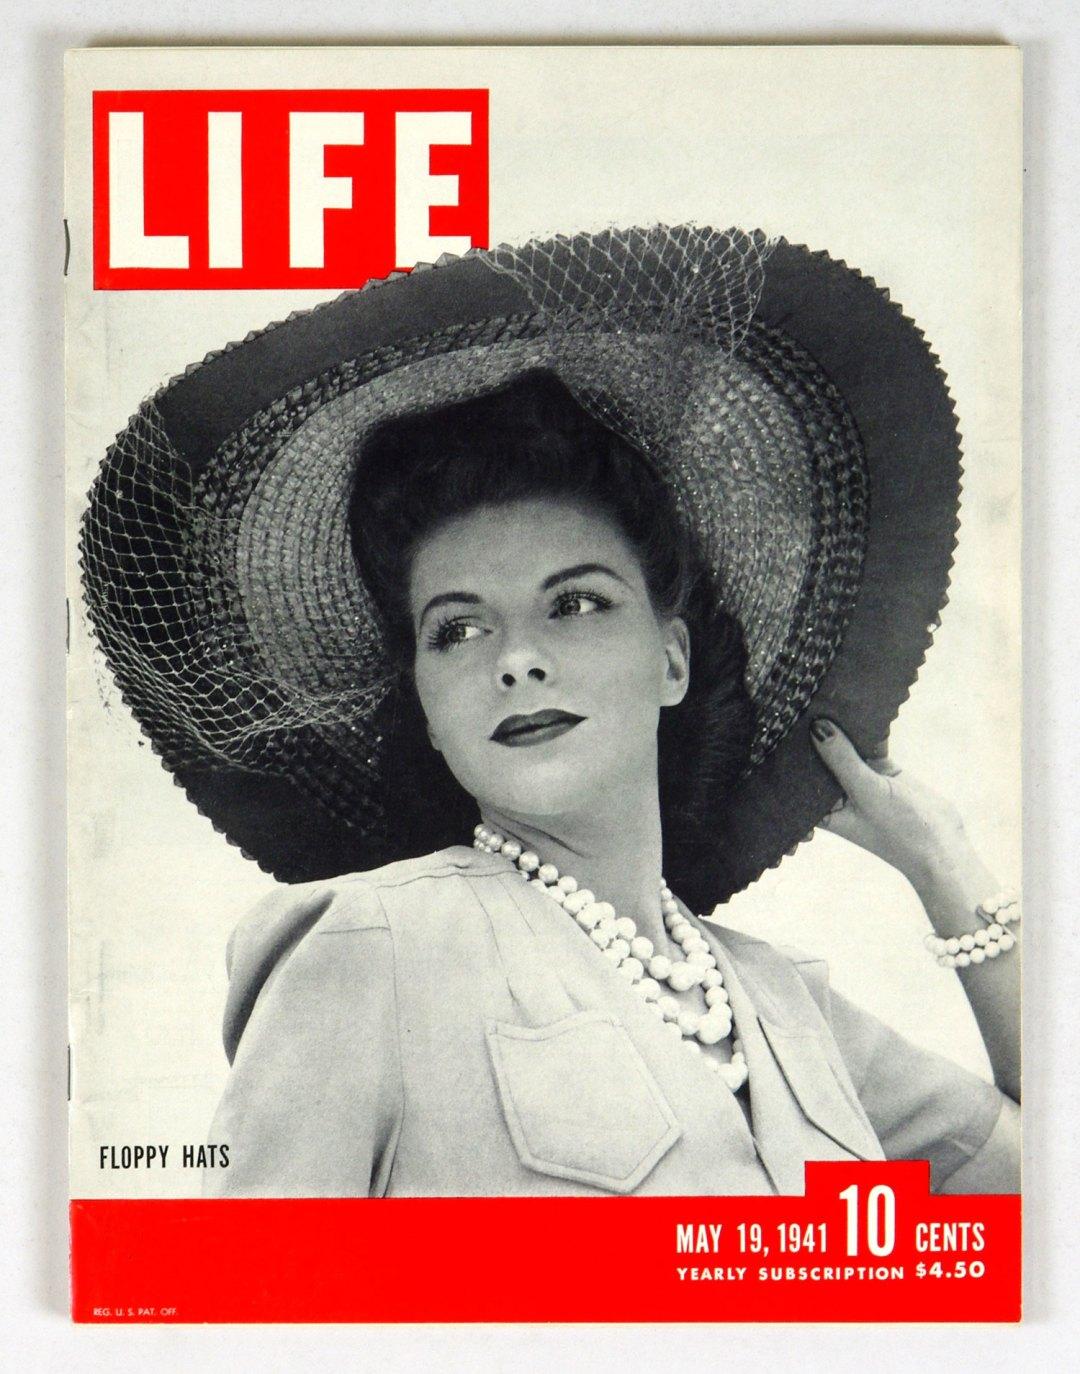 LIFE Magazine 1941 May 19 Floppy Hats